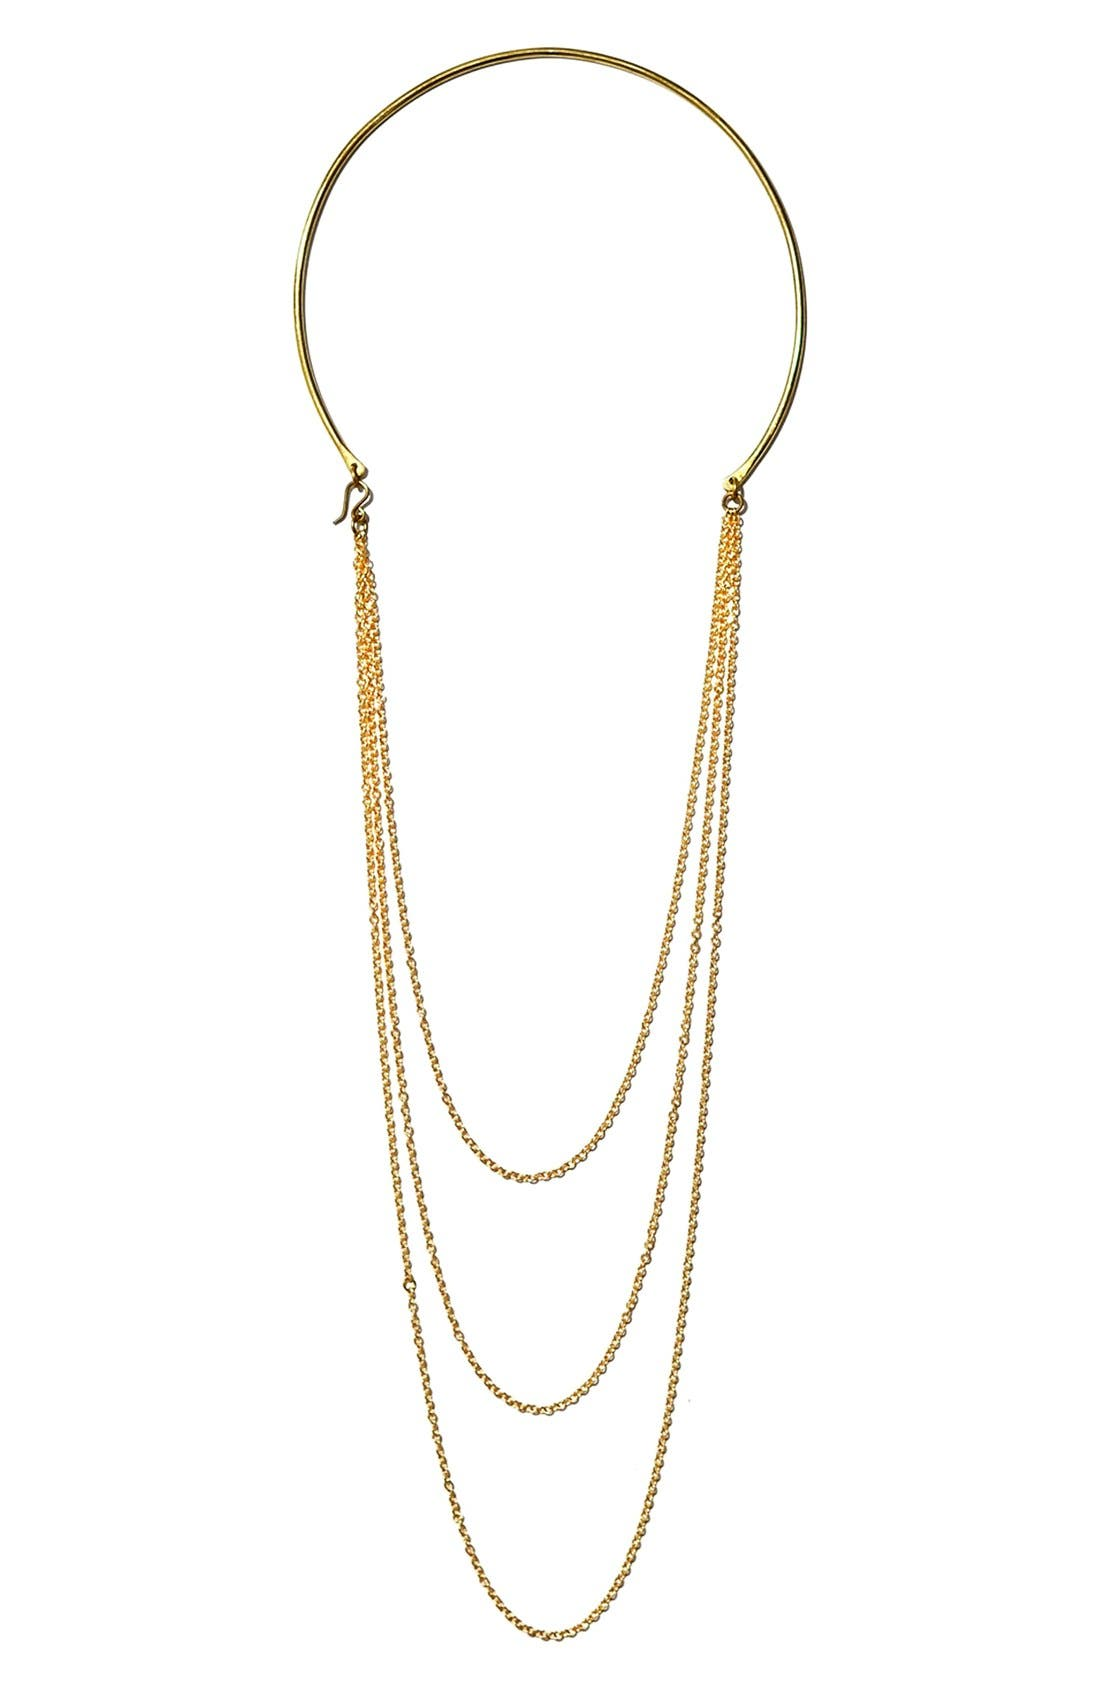 Alternate Image 1 Selected - Soko Draped Choker Necklace